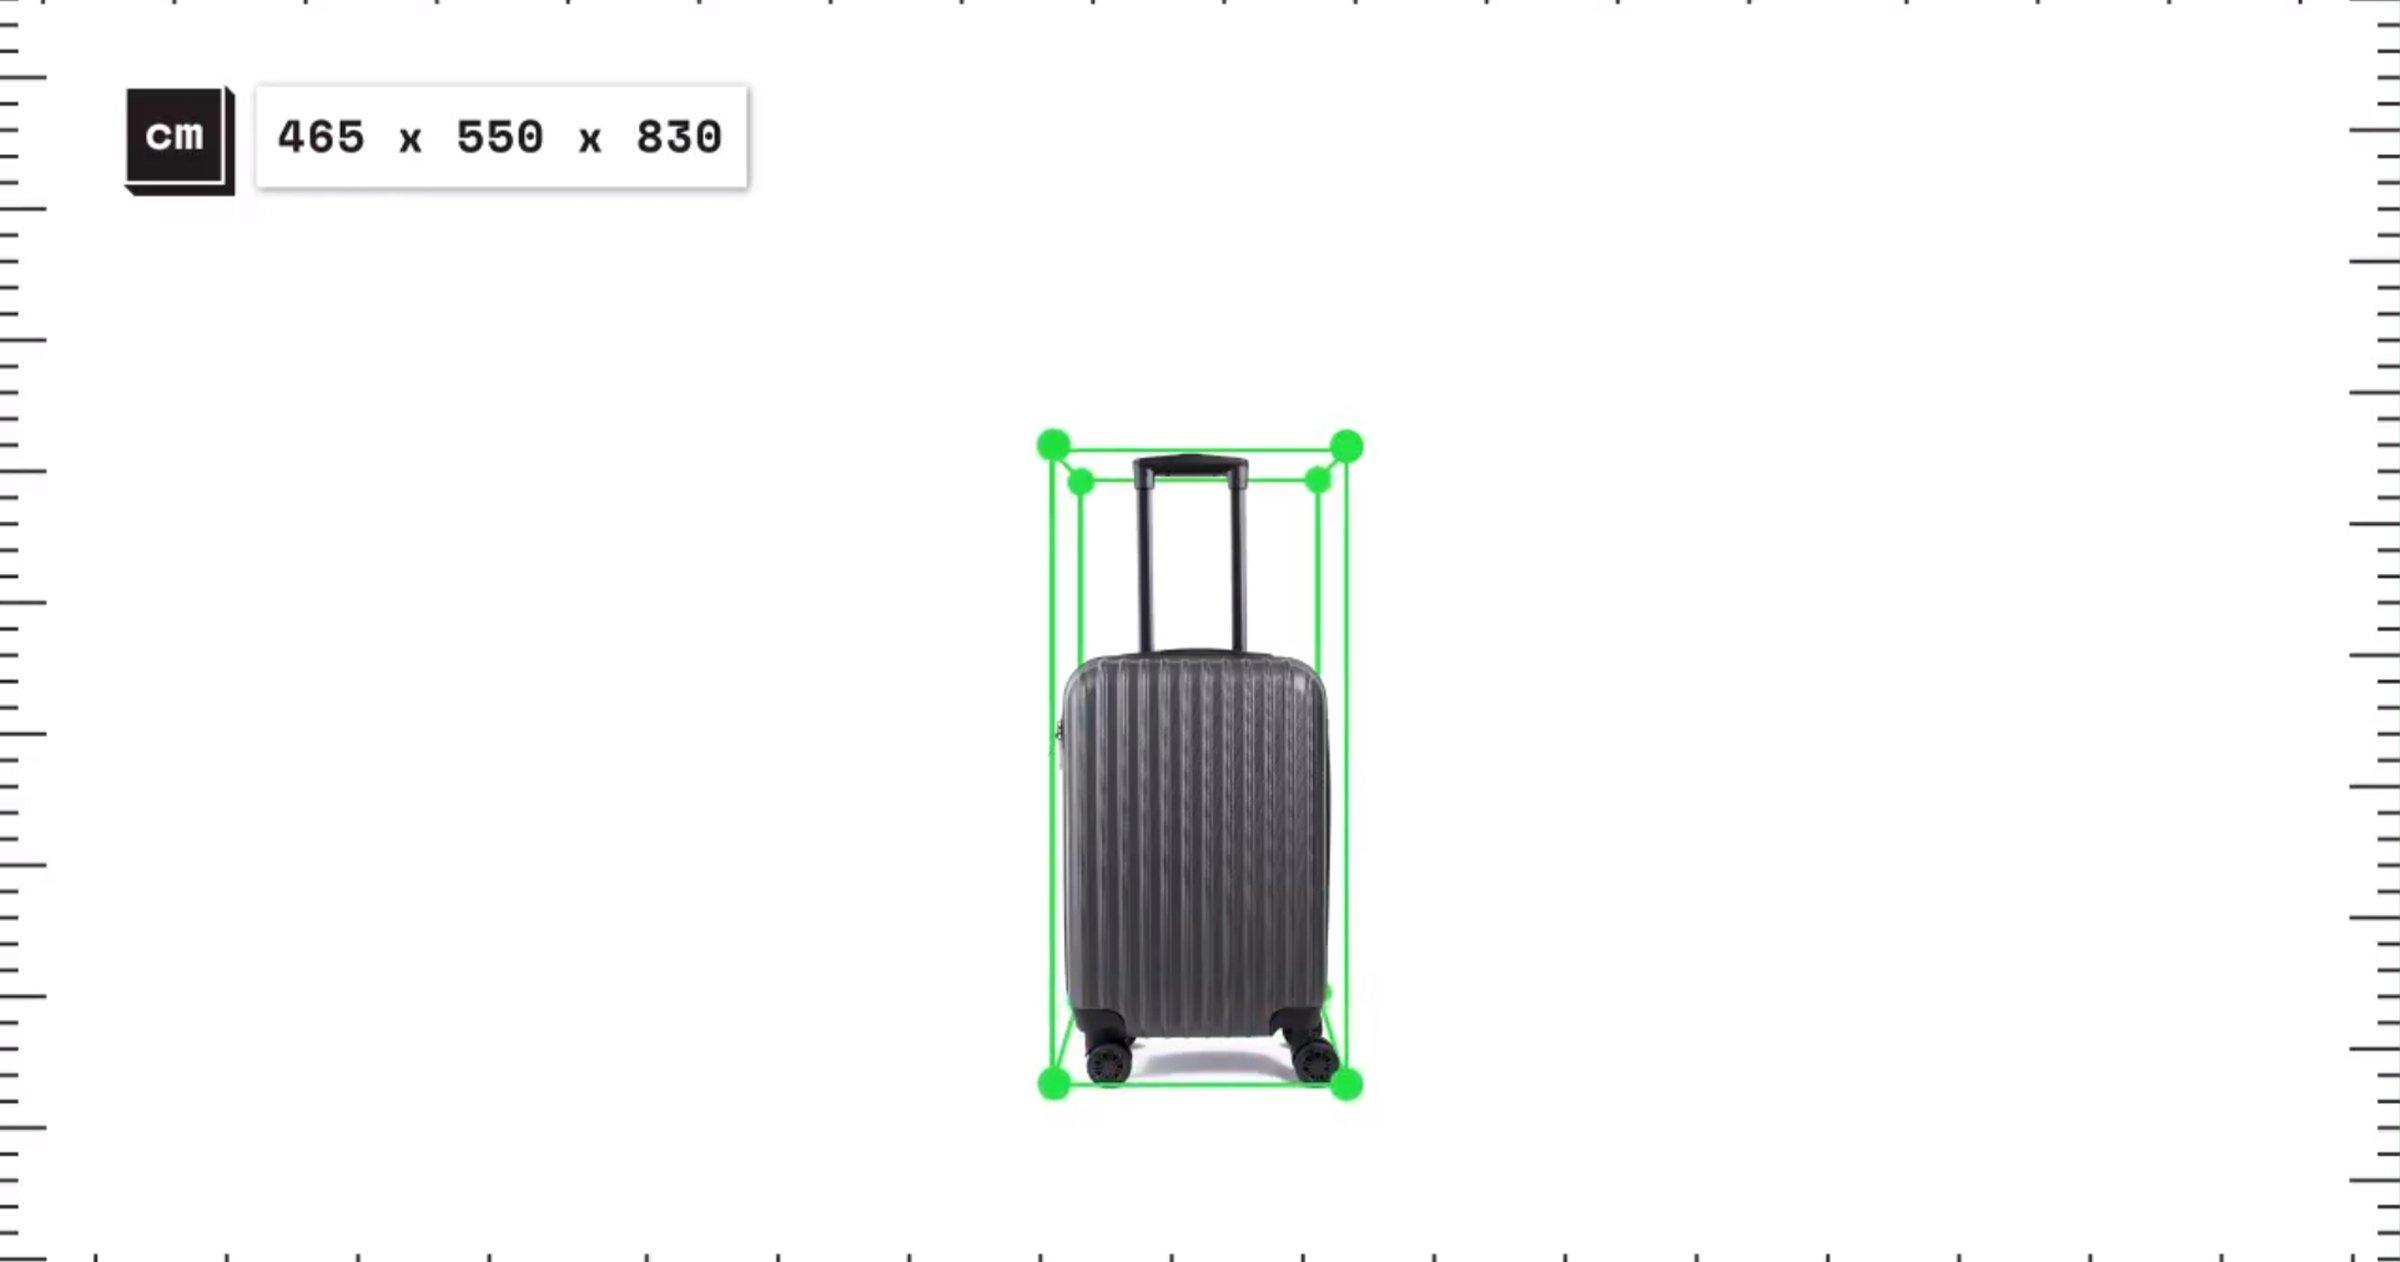 Mesurer la valise avec Google